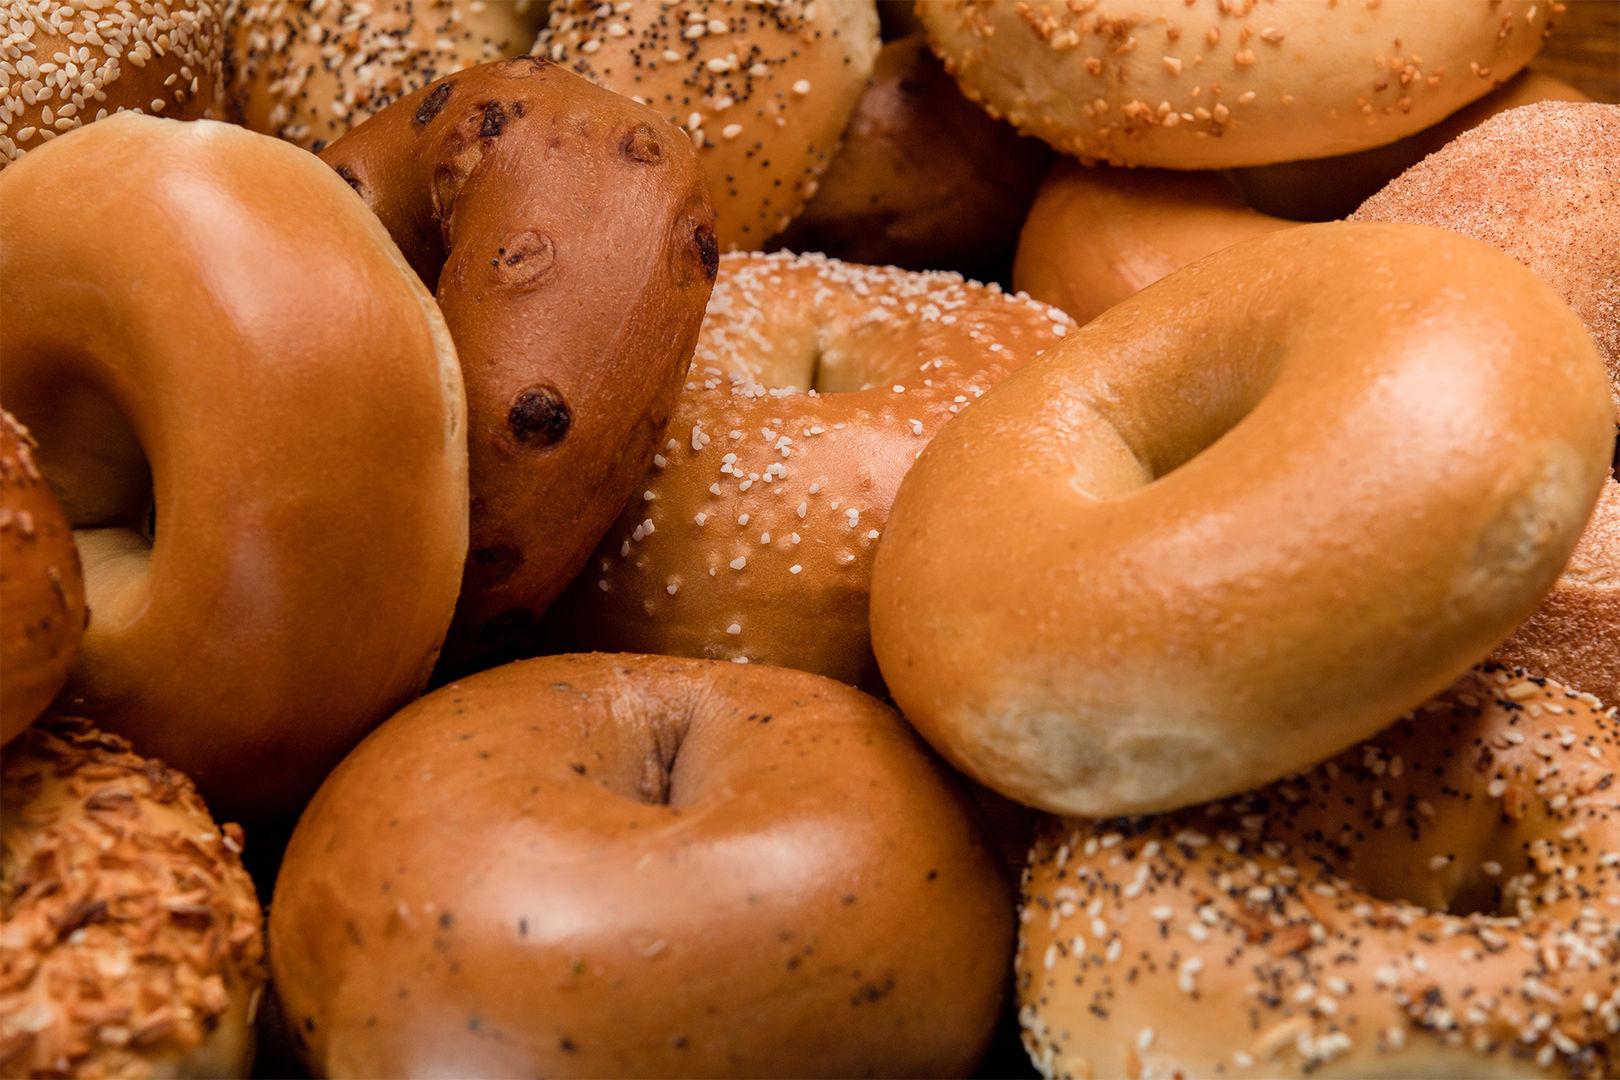 11 Ways To Enjoy your Bagel - Food Stuff Mall